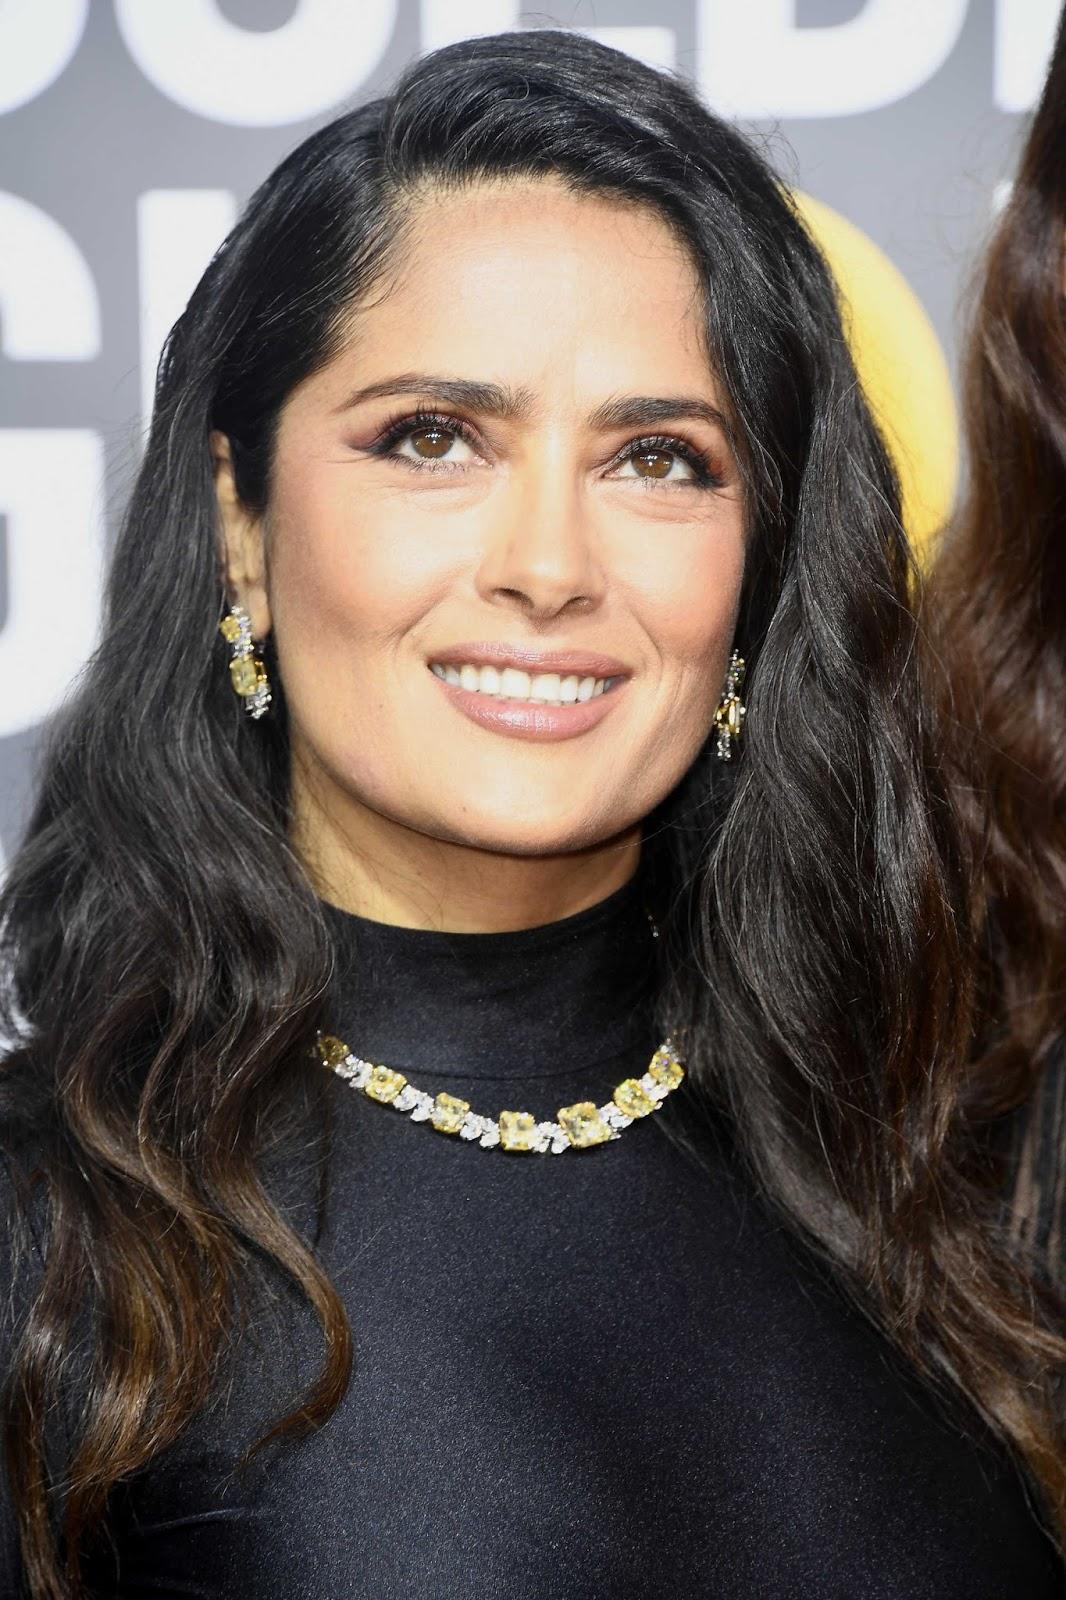 Salma Hayek Posing at the Golden Globe Awards 2018